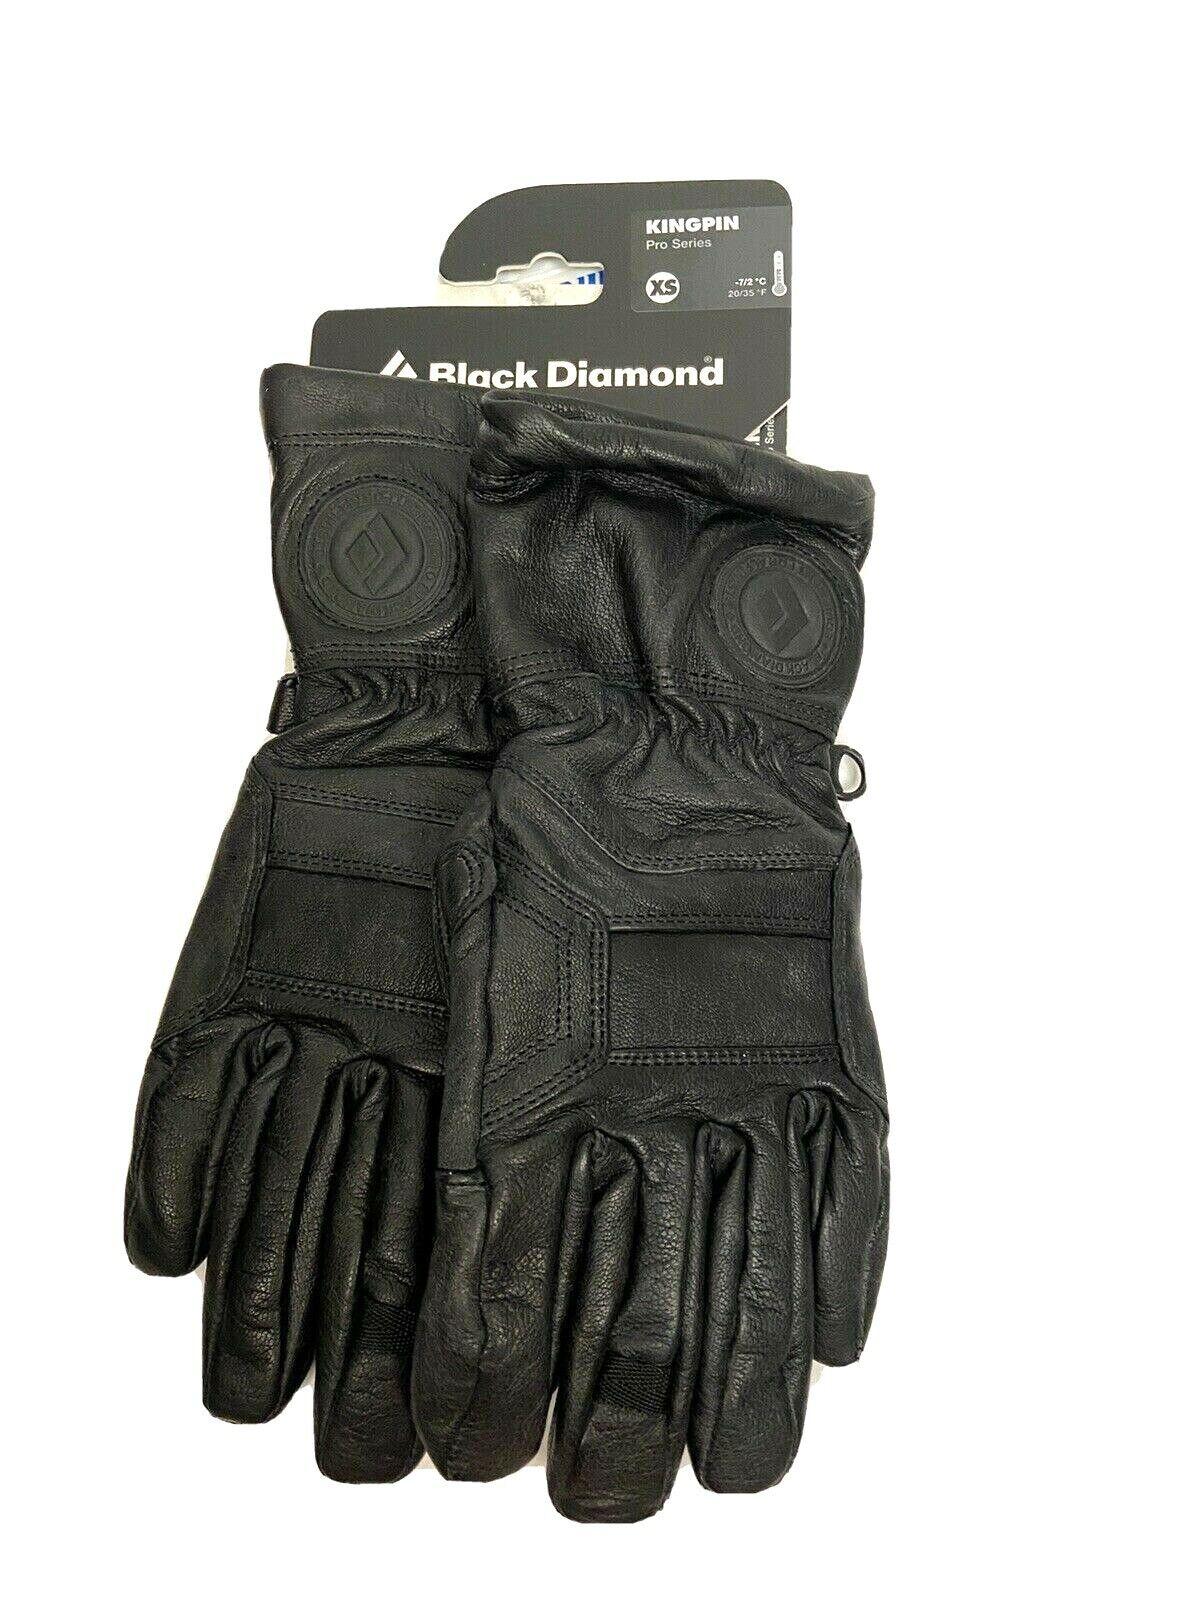 Black Diamond Men's Kingpin Pro Series Gloves XS Black Goat Leather NEW